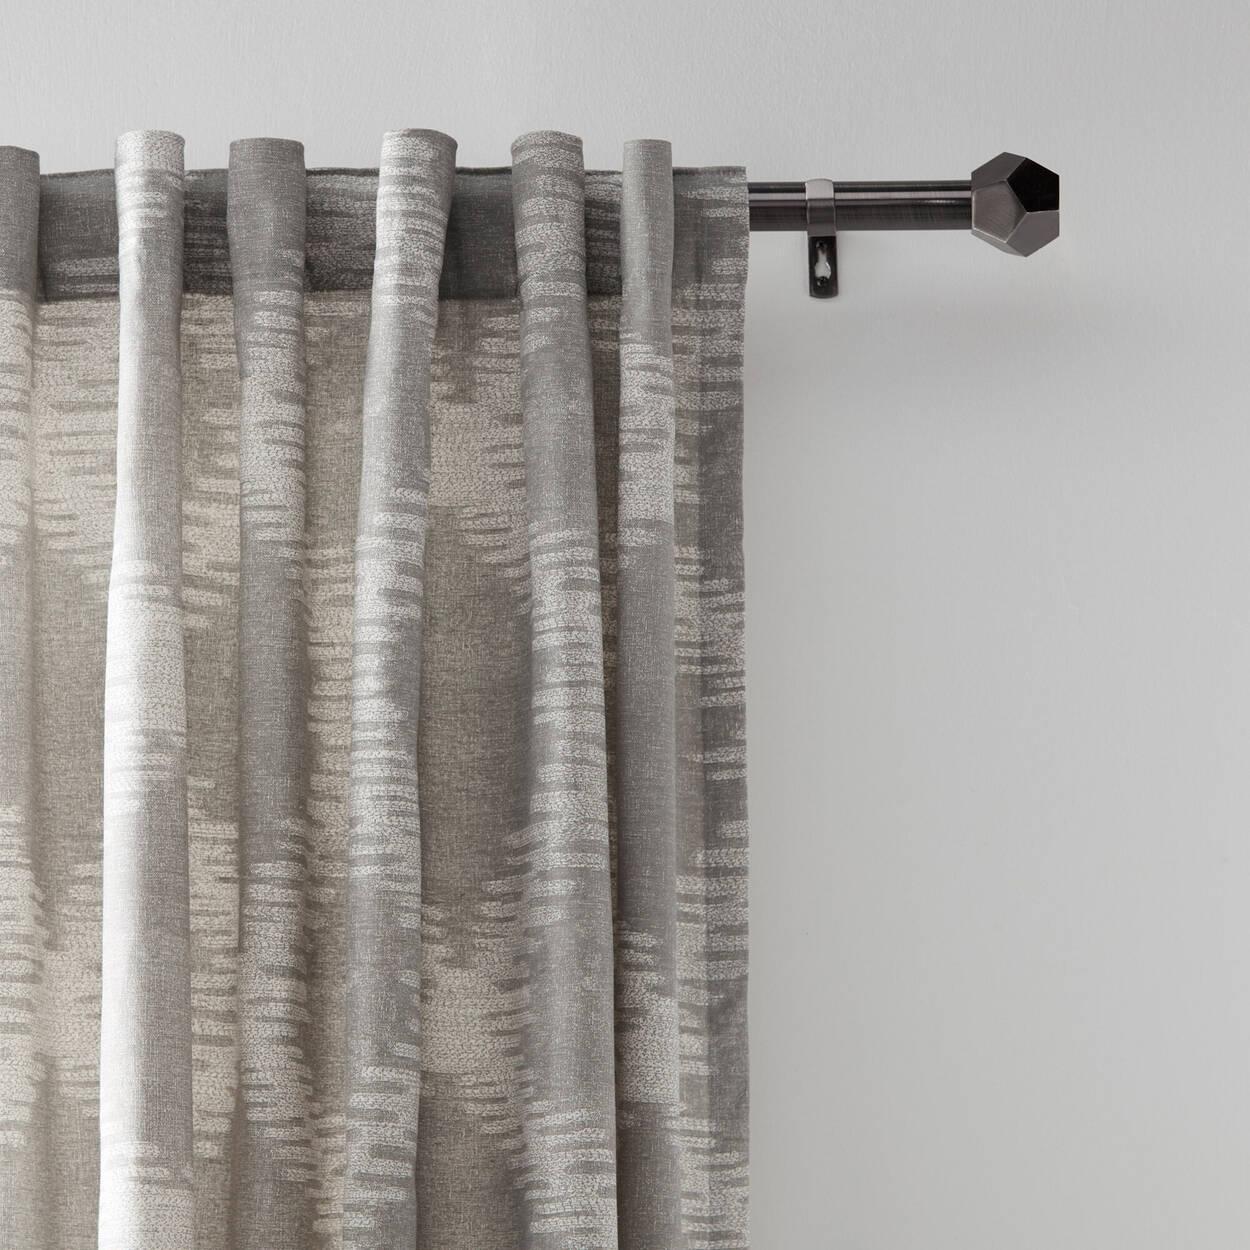 Hexagon Graphite Curtain Rod - Diameter 25/28 mm